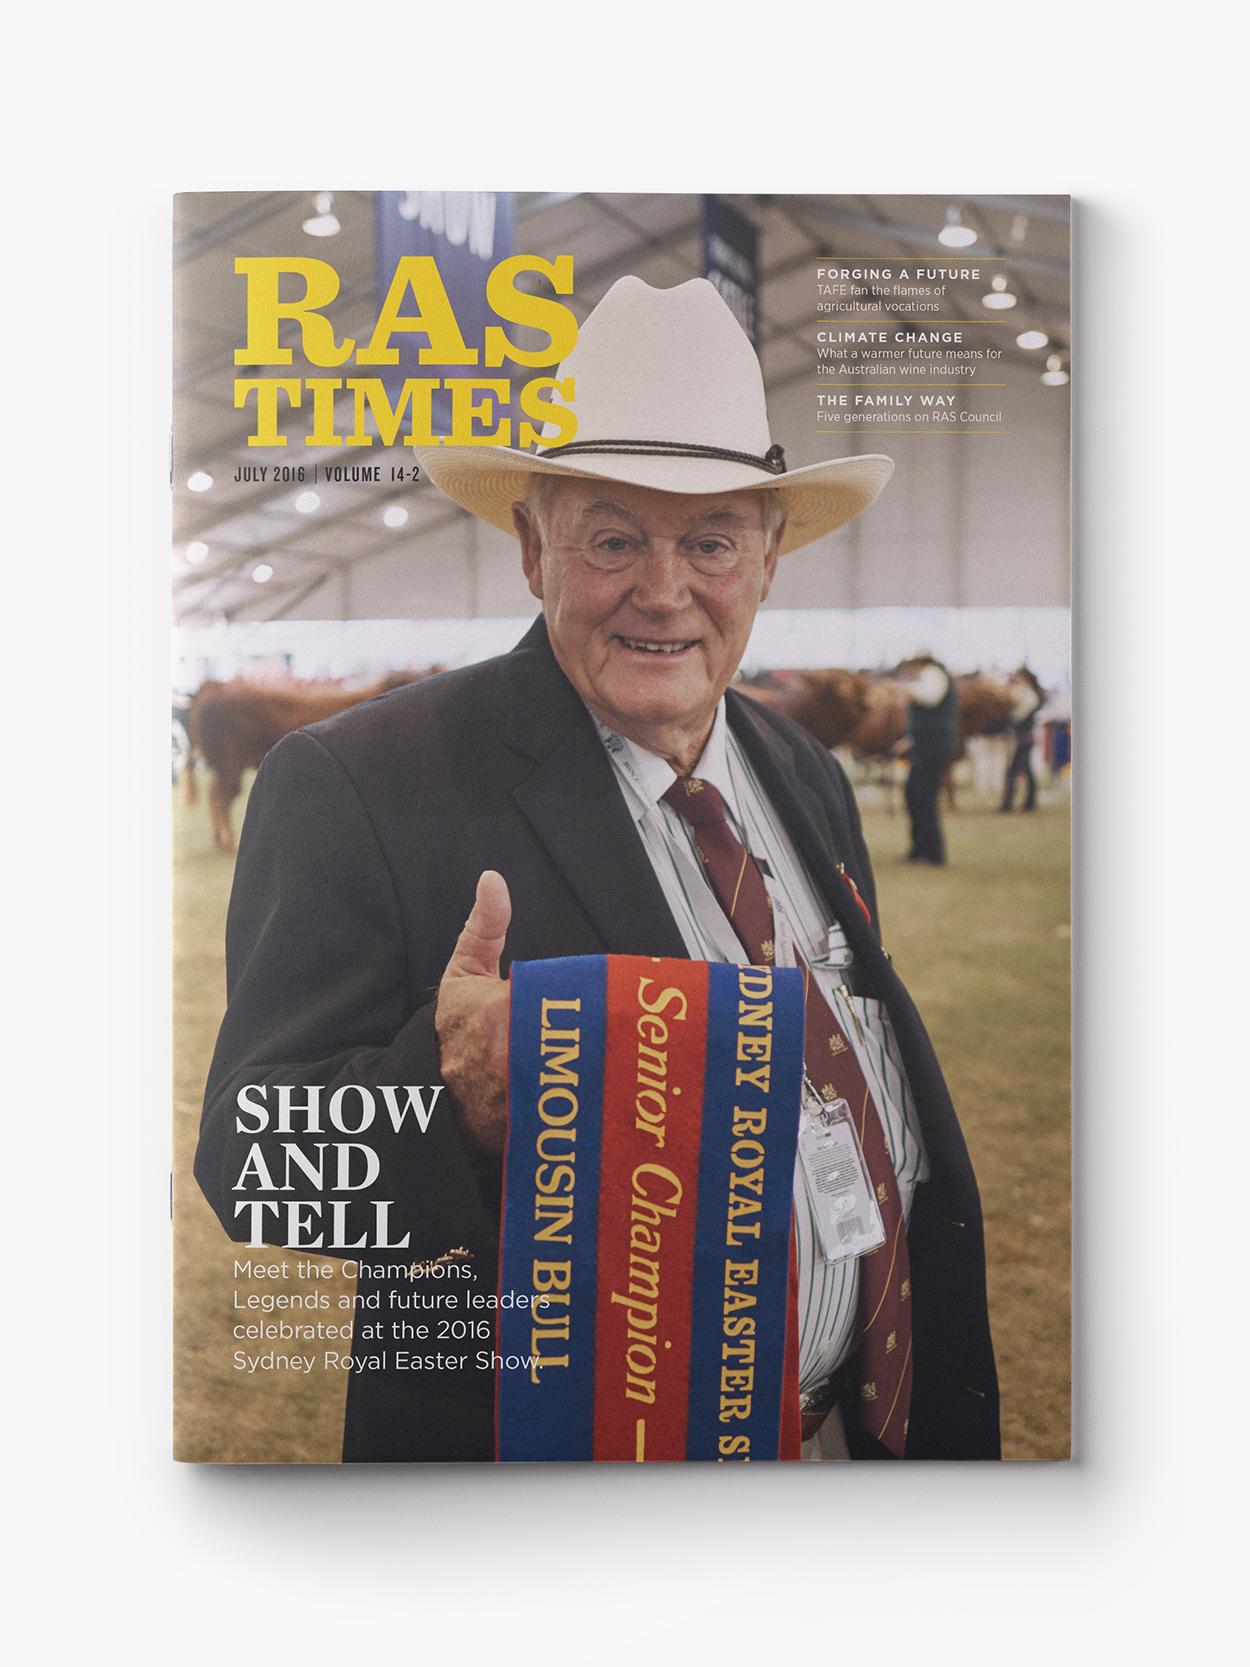 ras times_cover-single-1.jpg